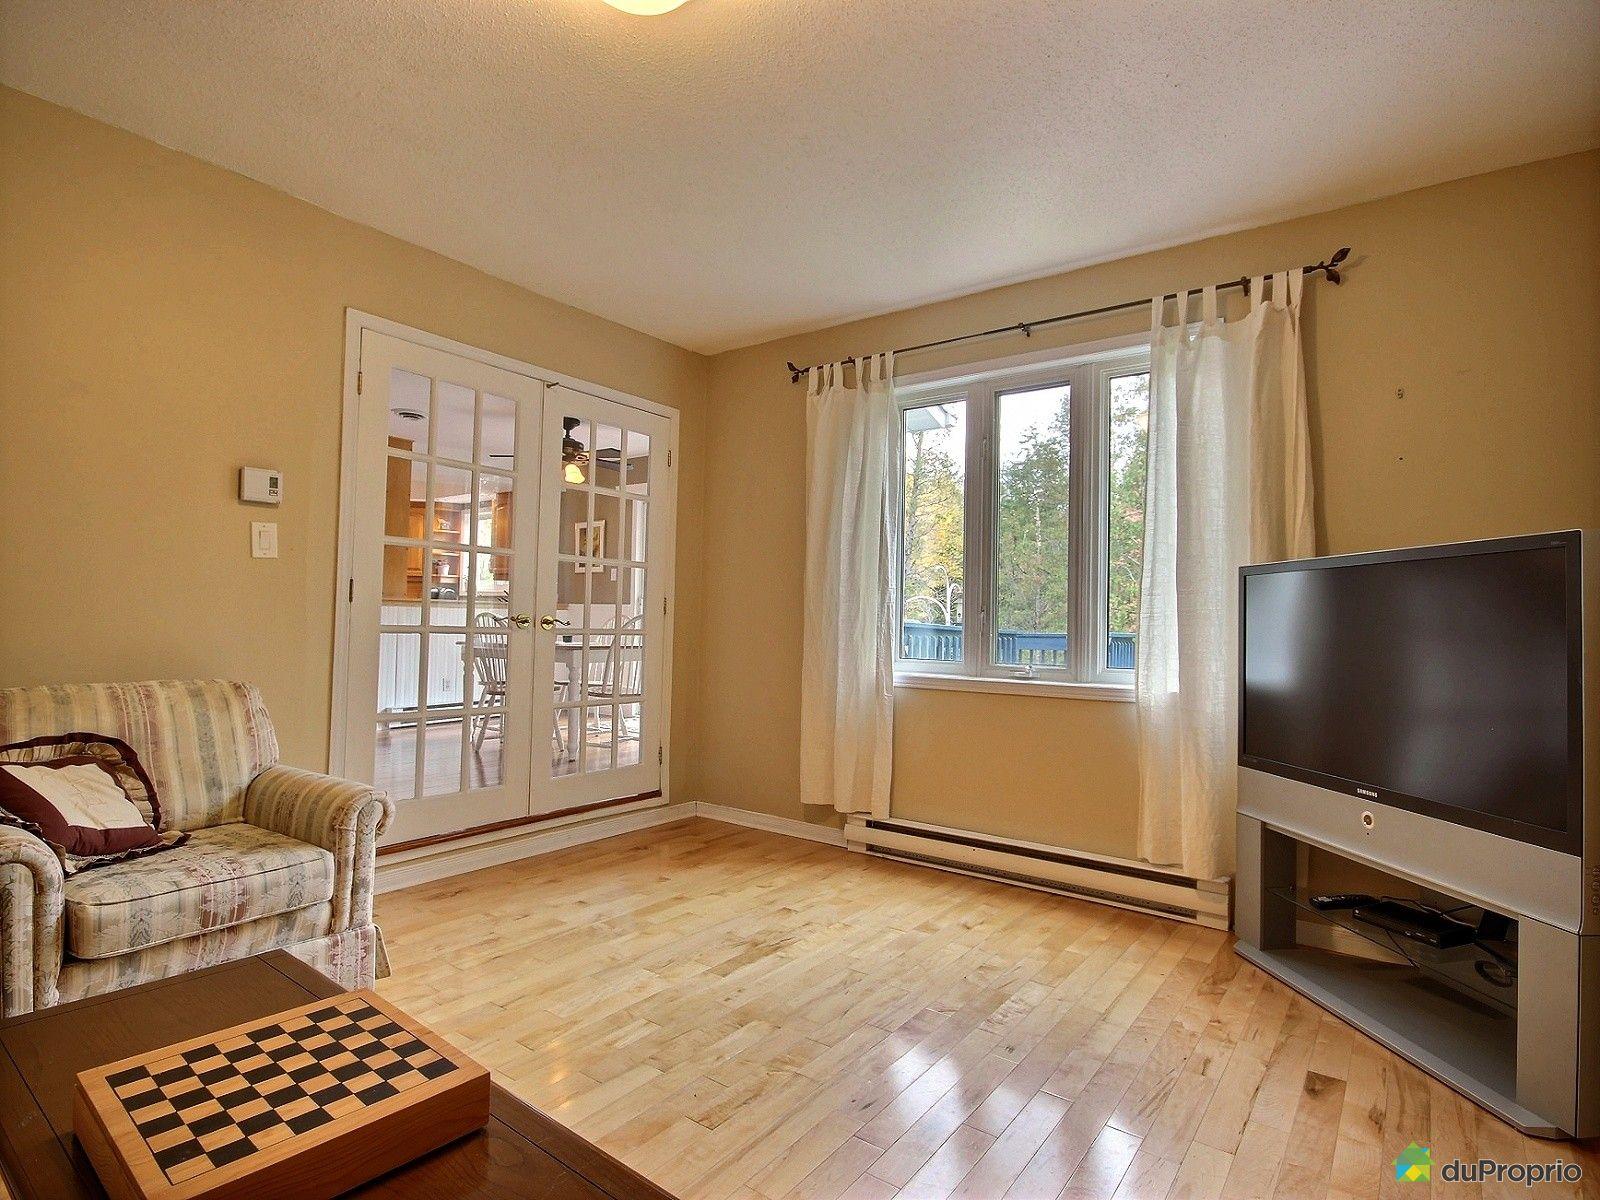 maison vendu cantley immobilier qu bec duproprio 186894. Black Bedroom Furniture Sets. Home Design Ideas